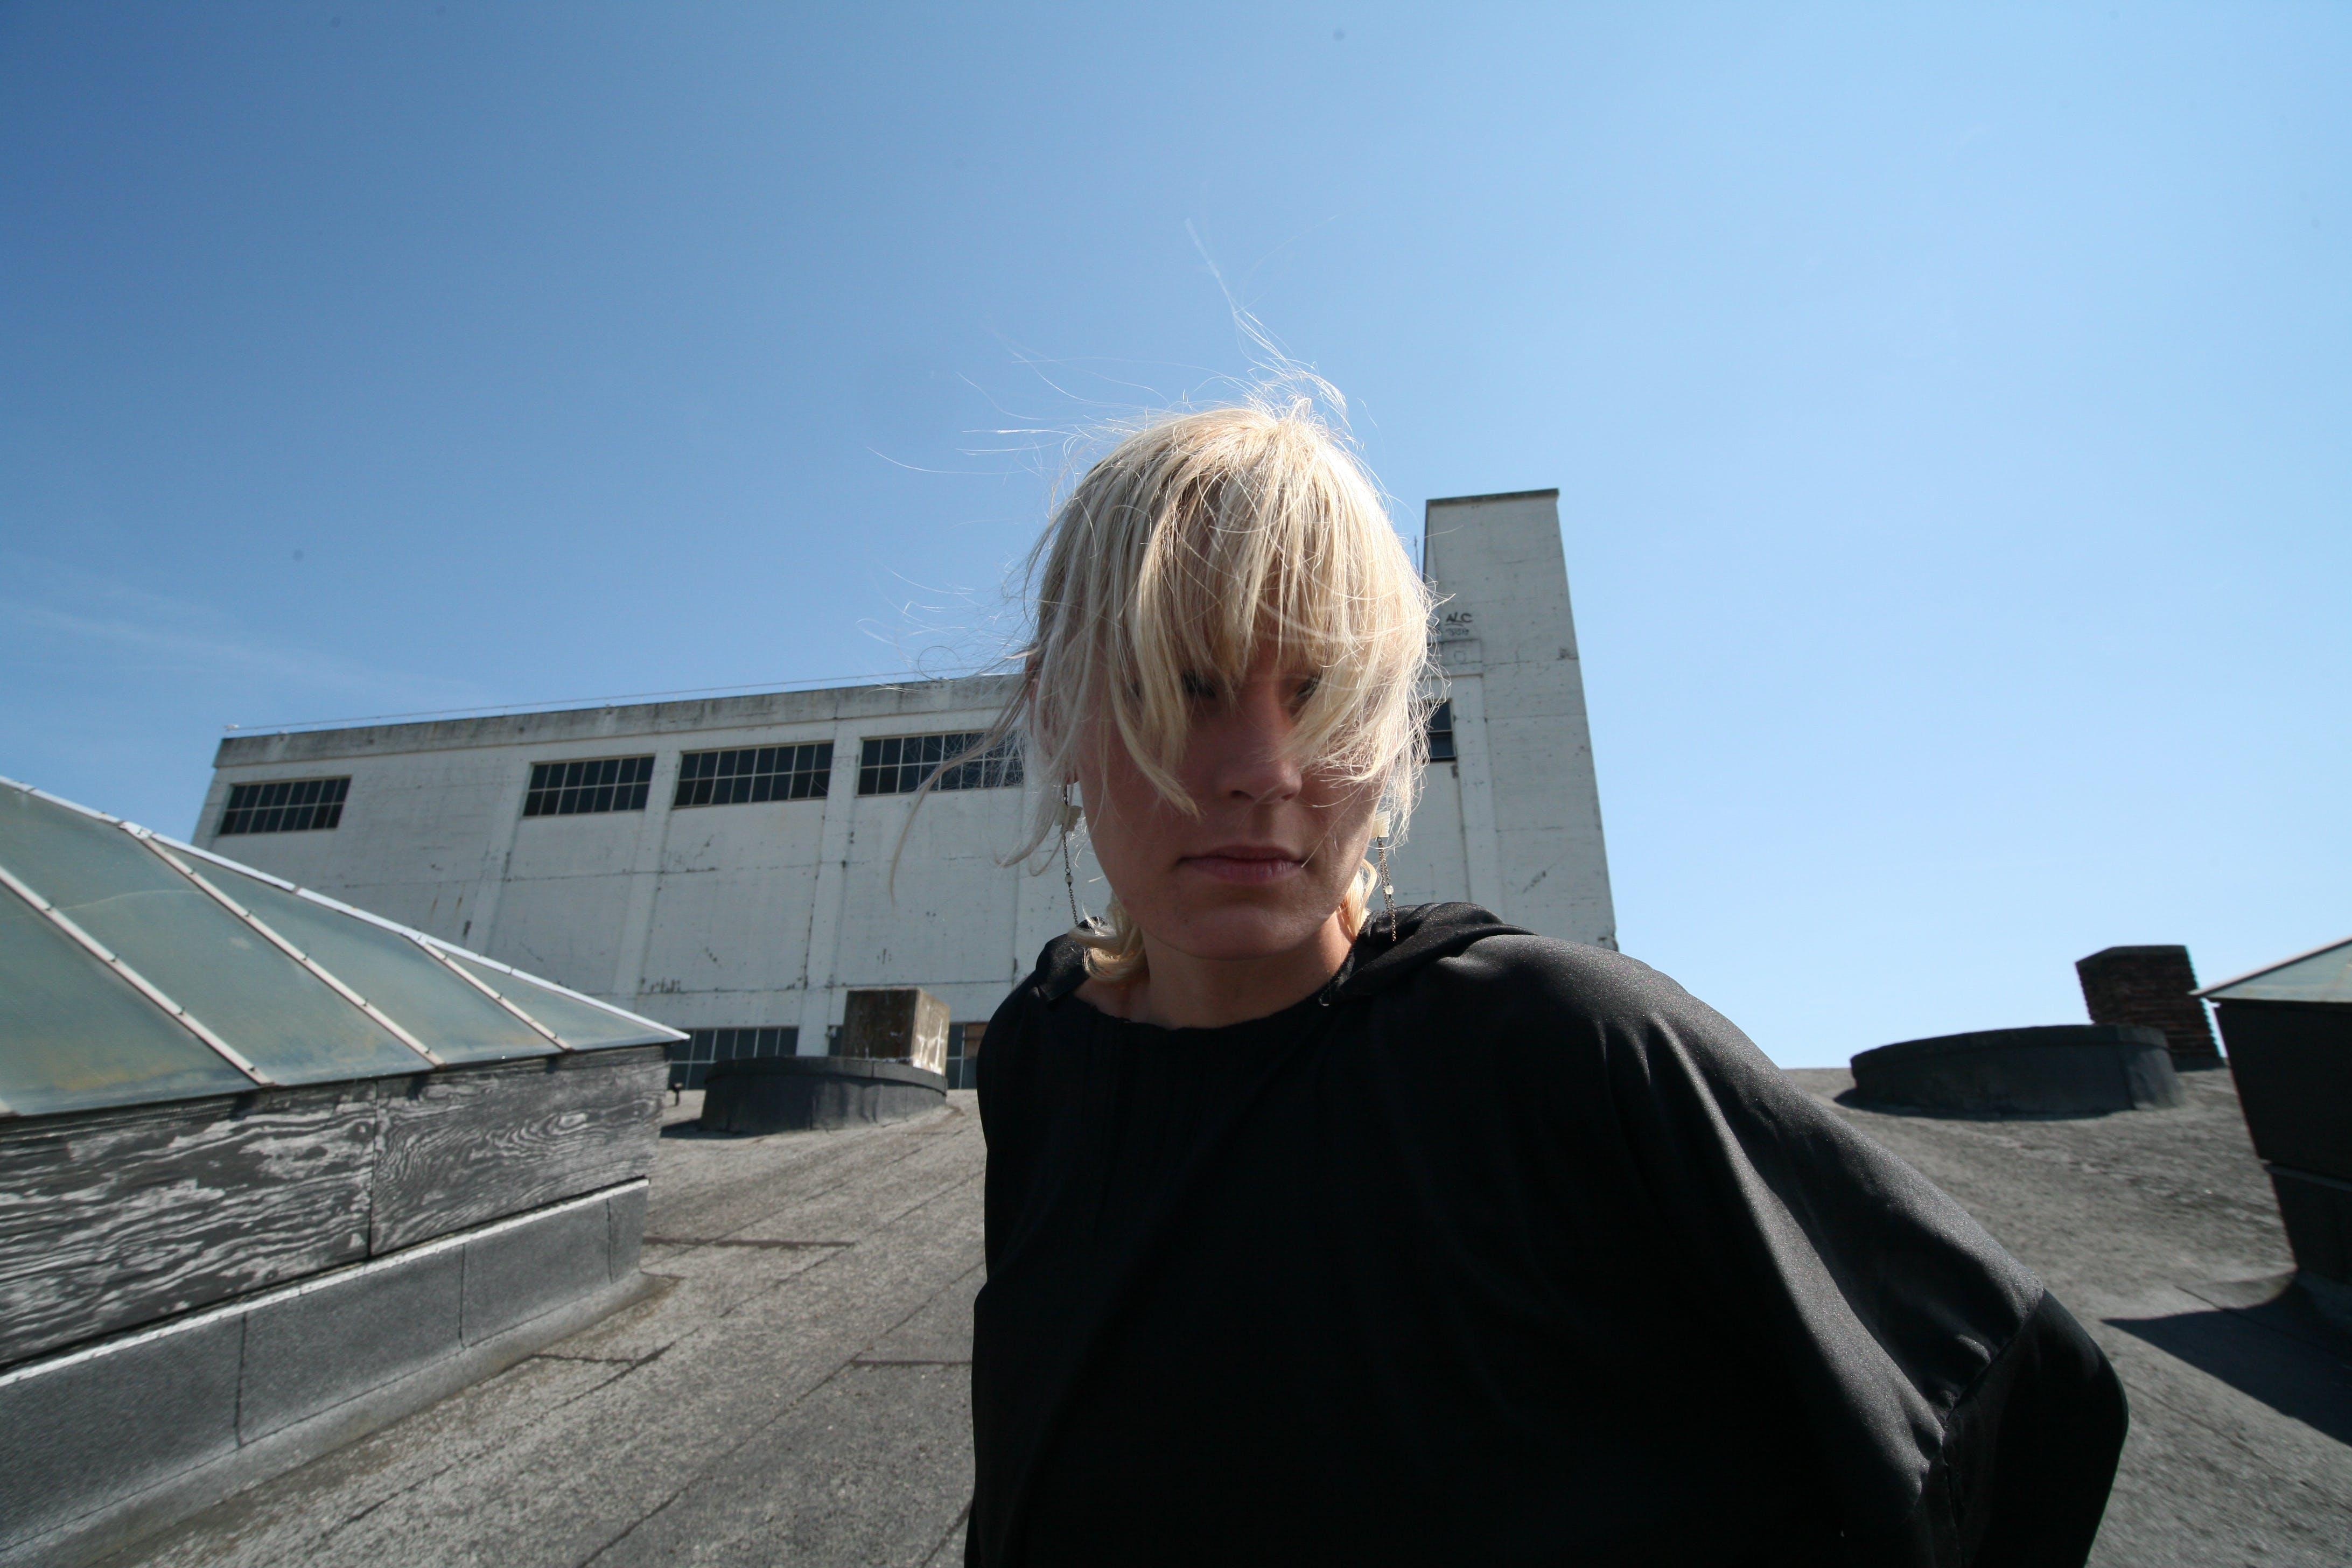 Woman Standing on Grey Concrete Pavement Under Blue Sky